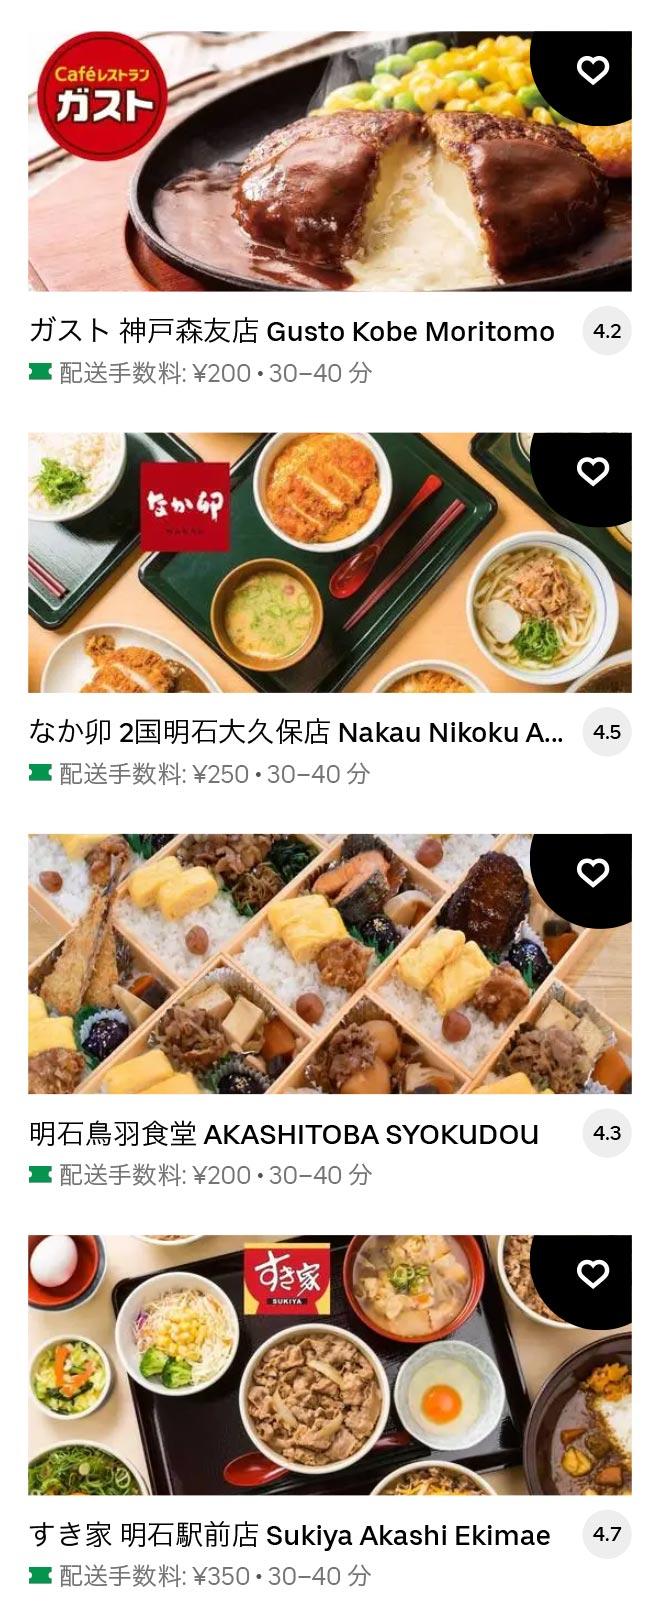 U nishi akashi 2103 08